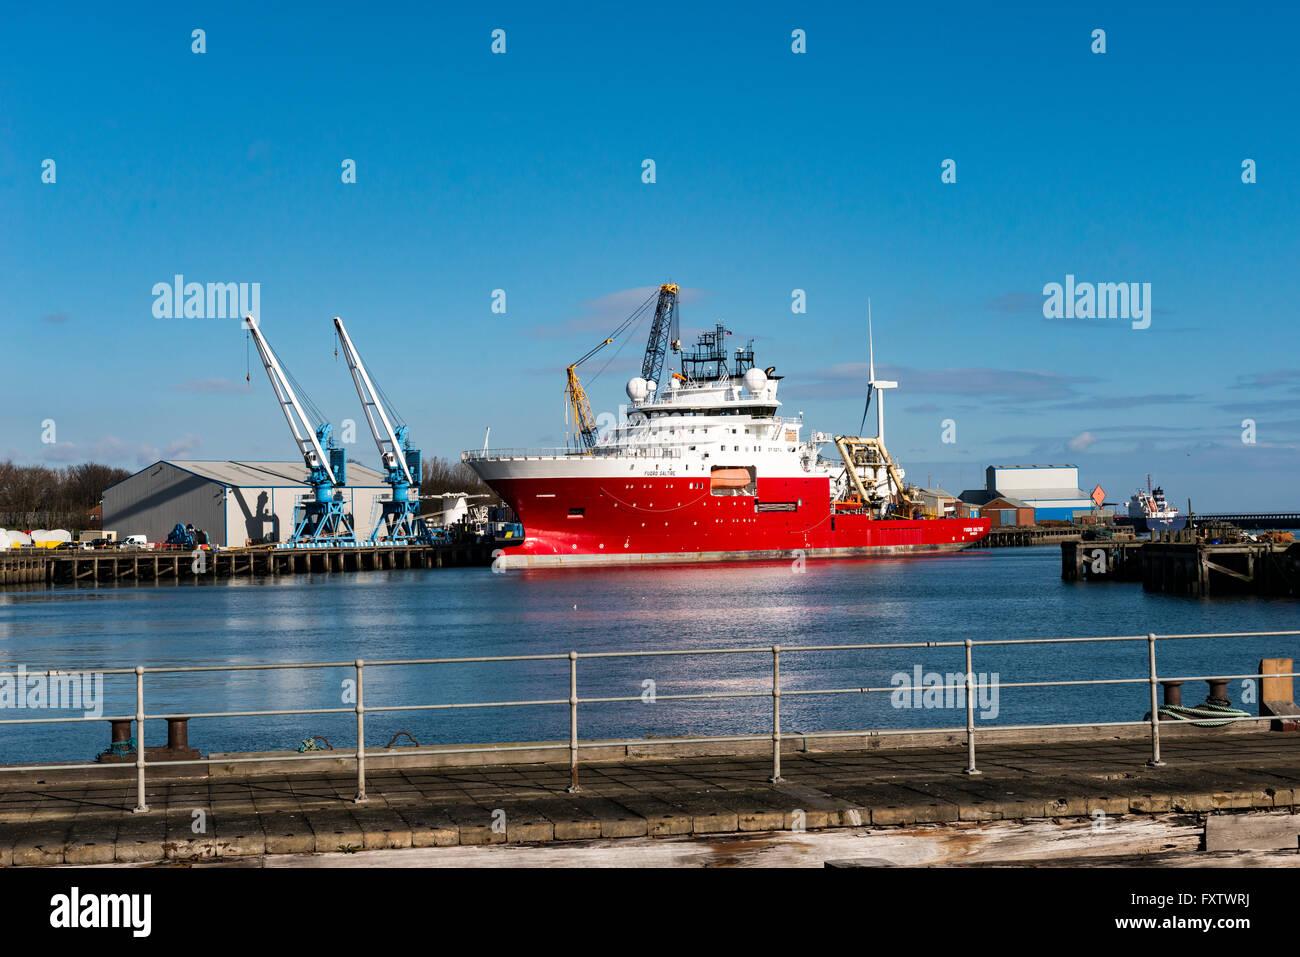 Port of Blyth - Stock Image